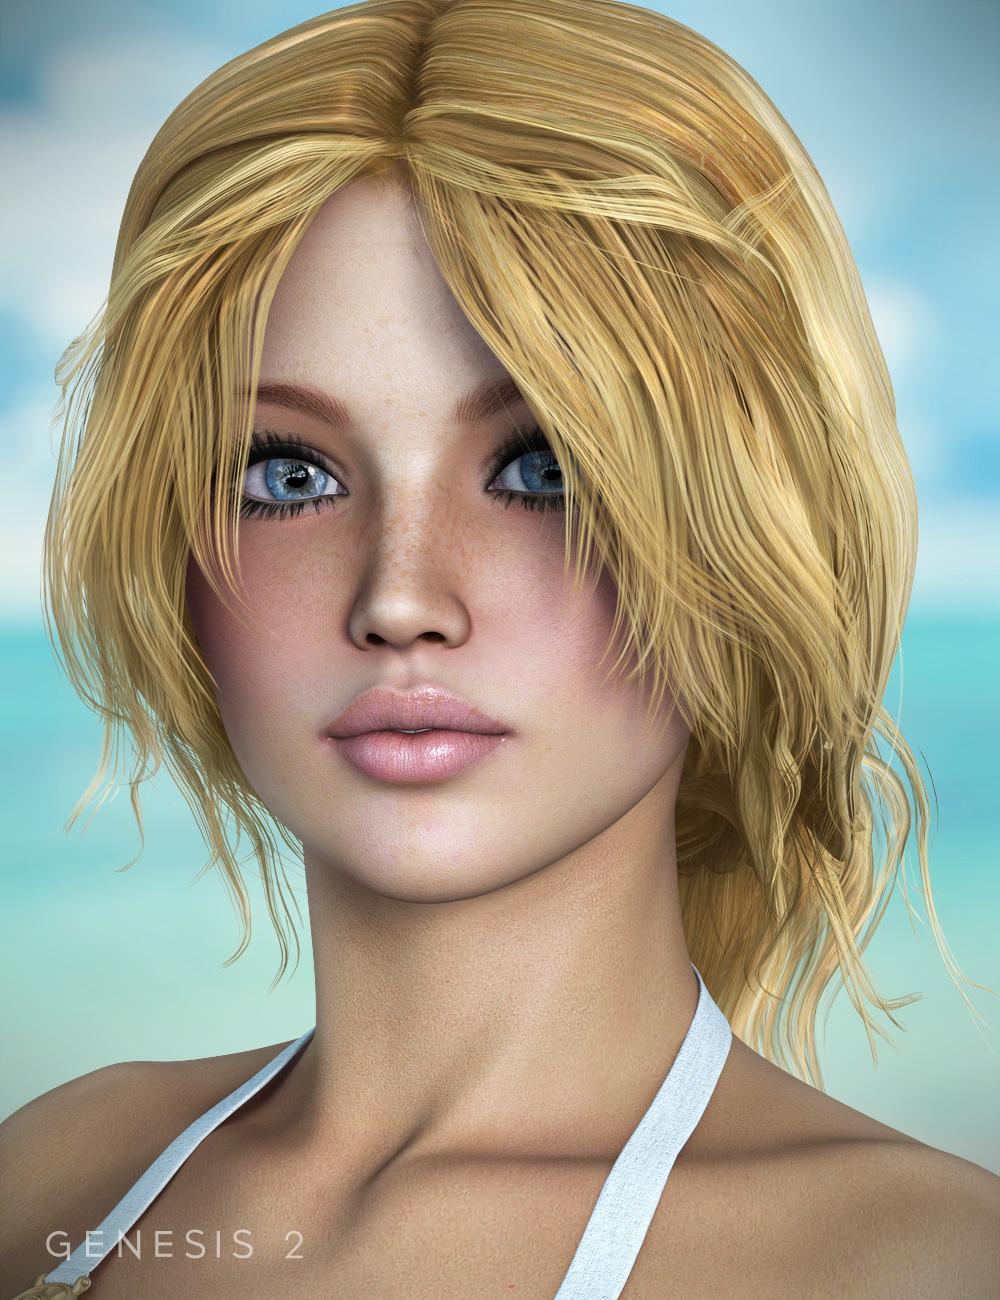 Hawthorn Hair for Genesis and Genesis 2 Female(s) by: goldtassel, 3D Models by Daz 3D